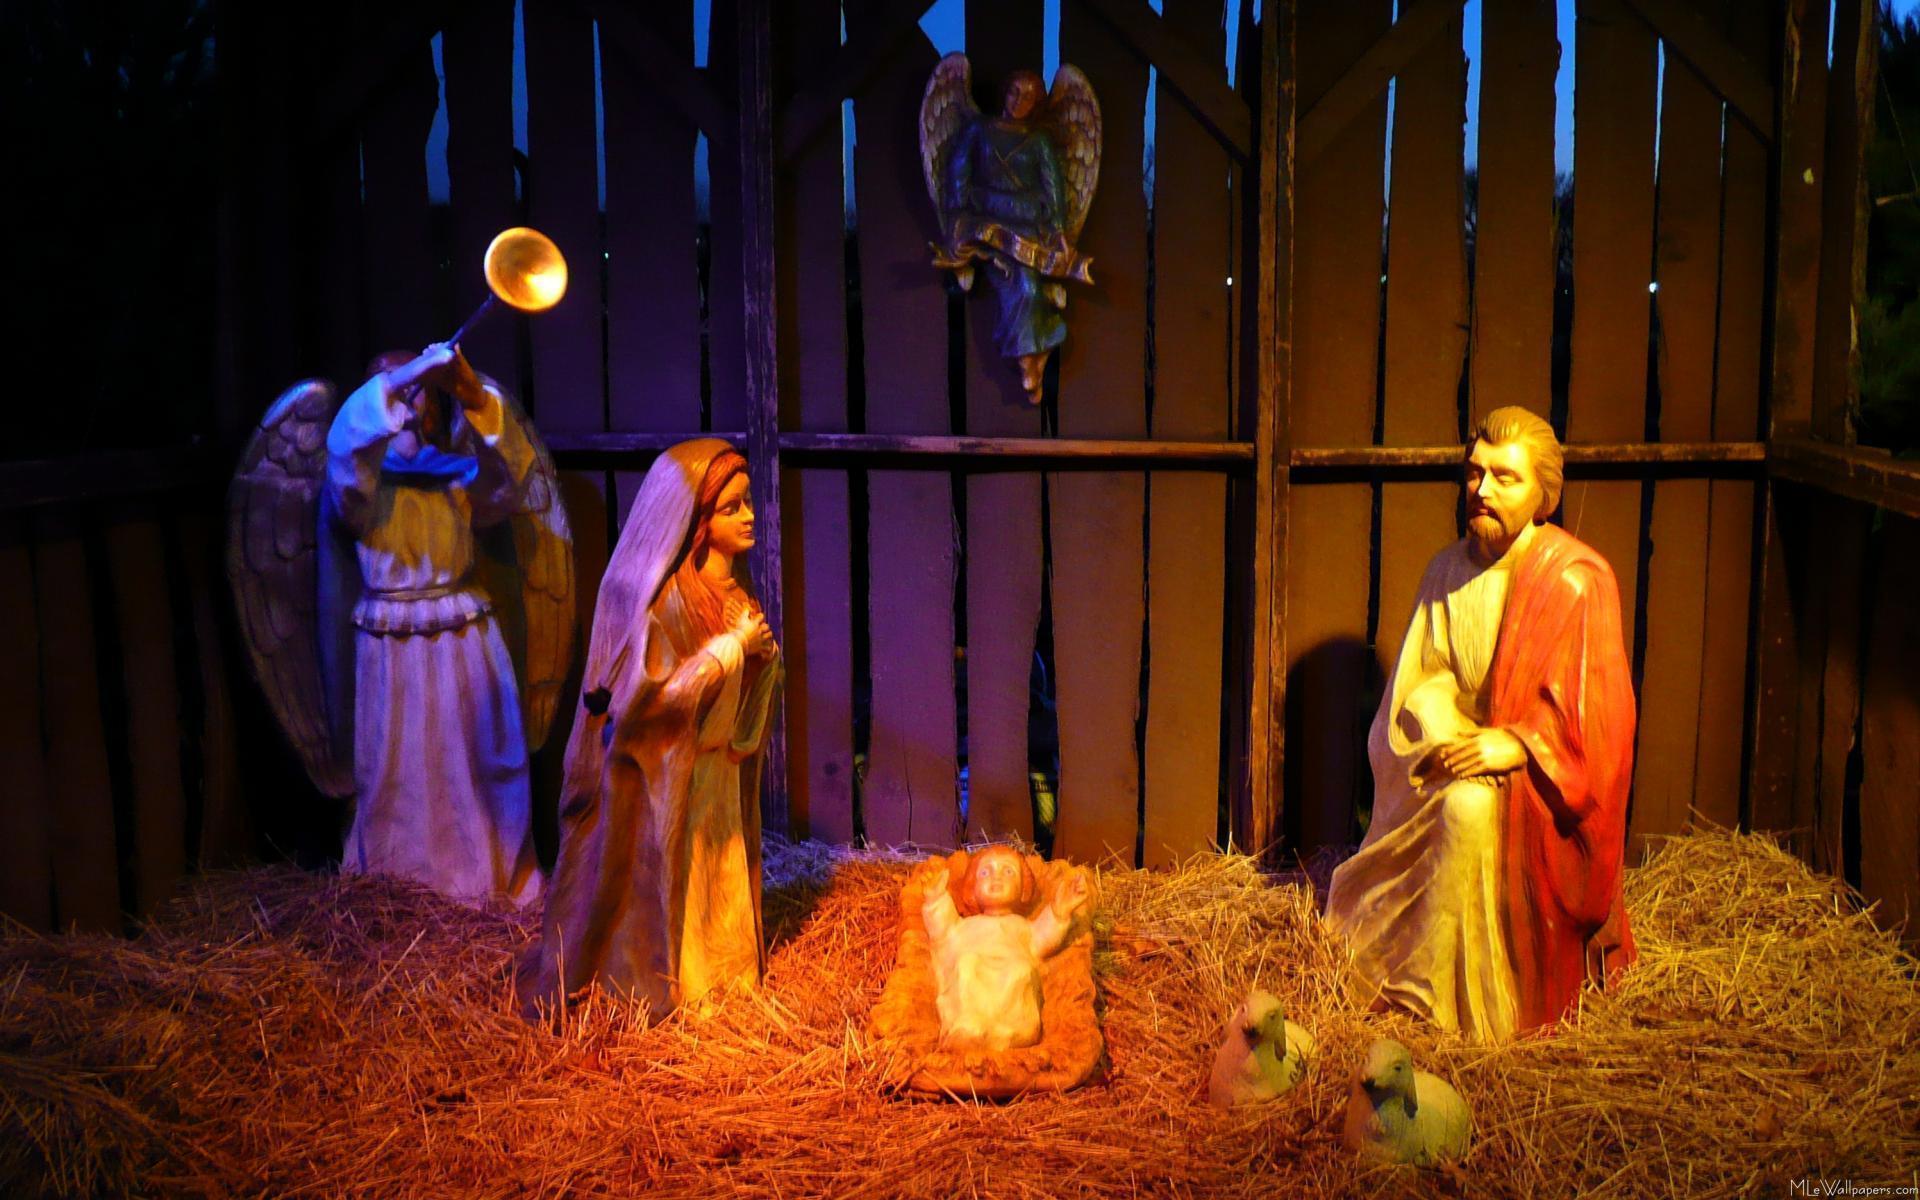 empty manger hd wallpaper - photo #21